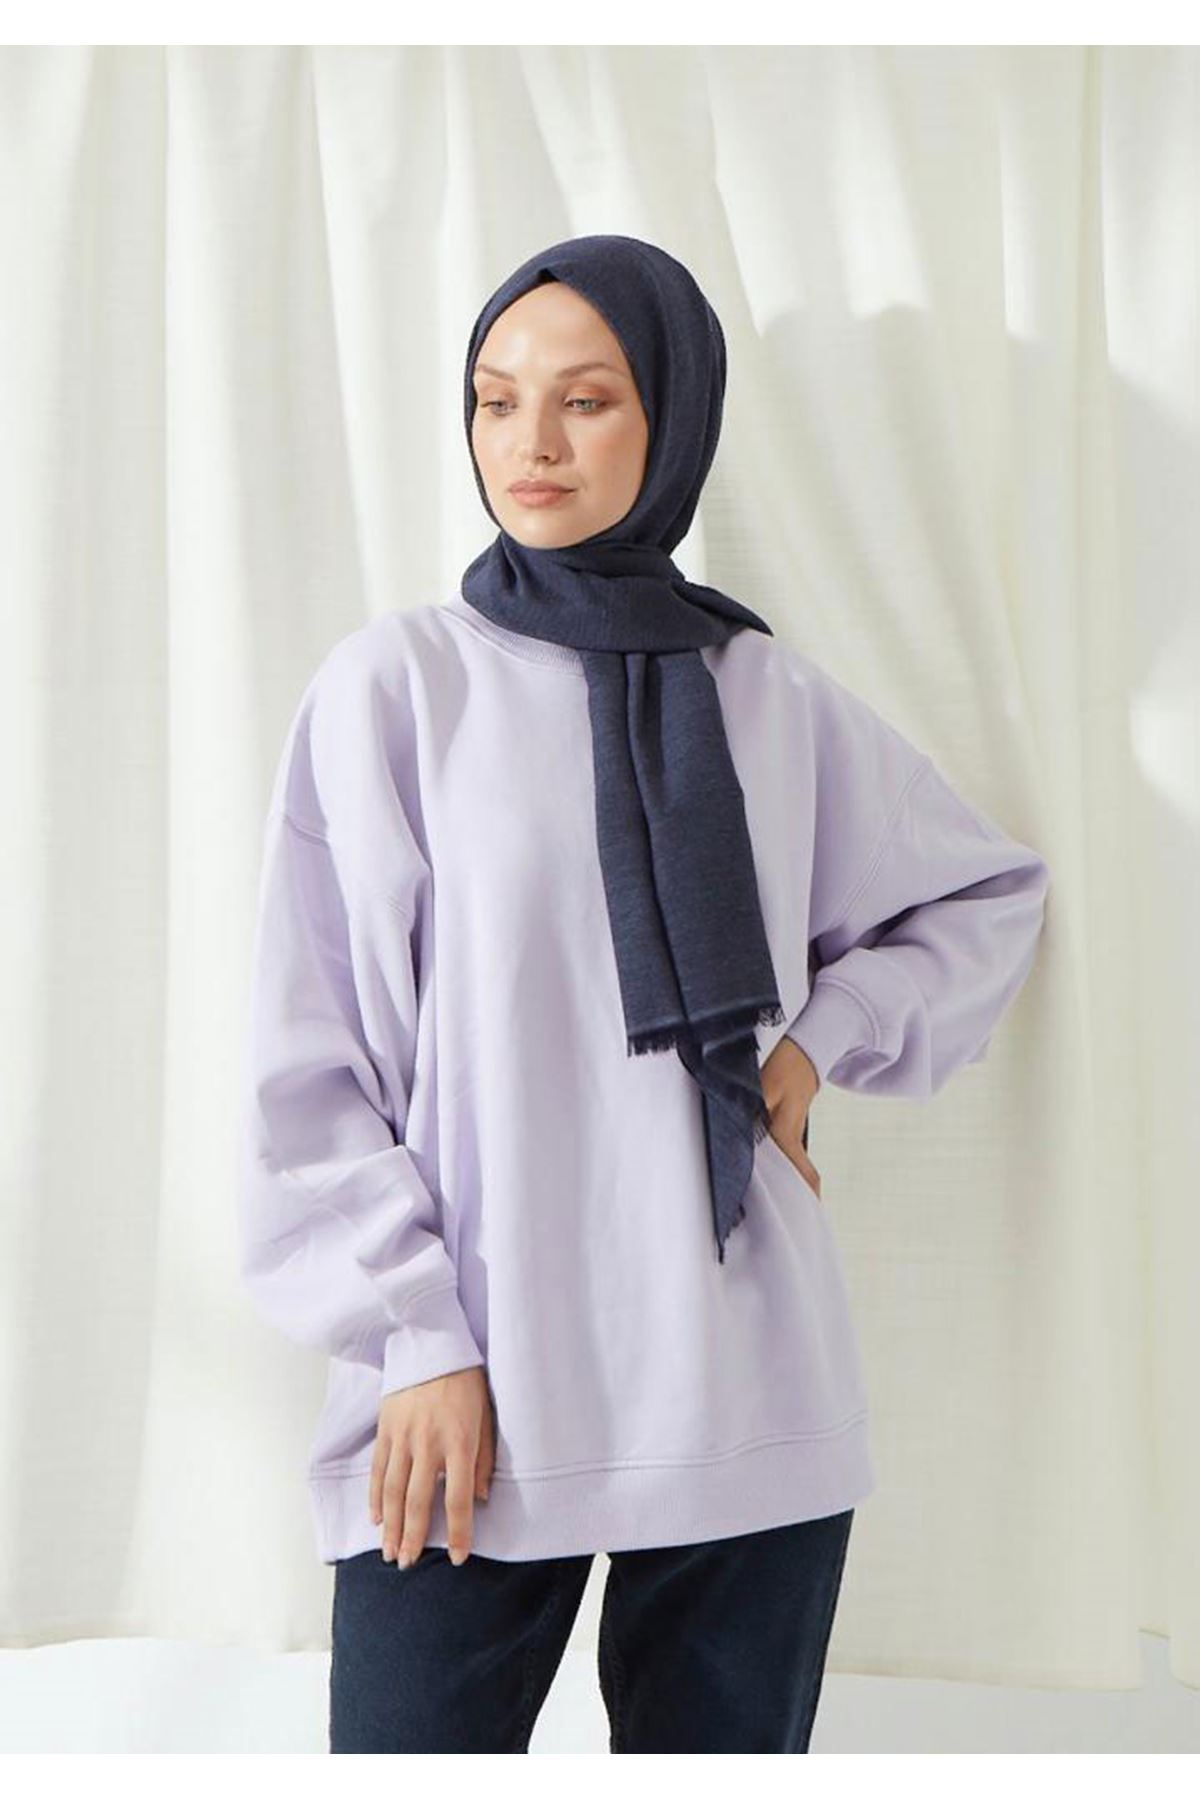 14027 Cotton Shawl - Denim Blue